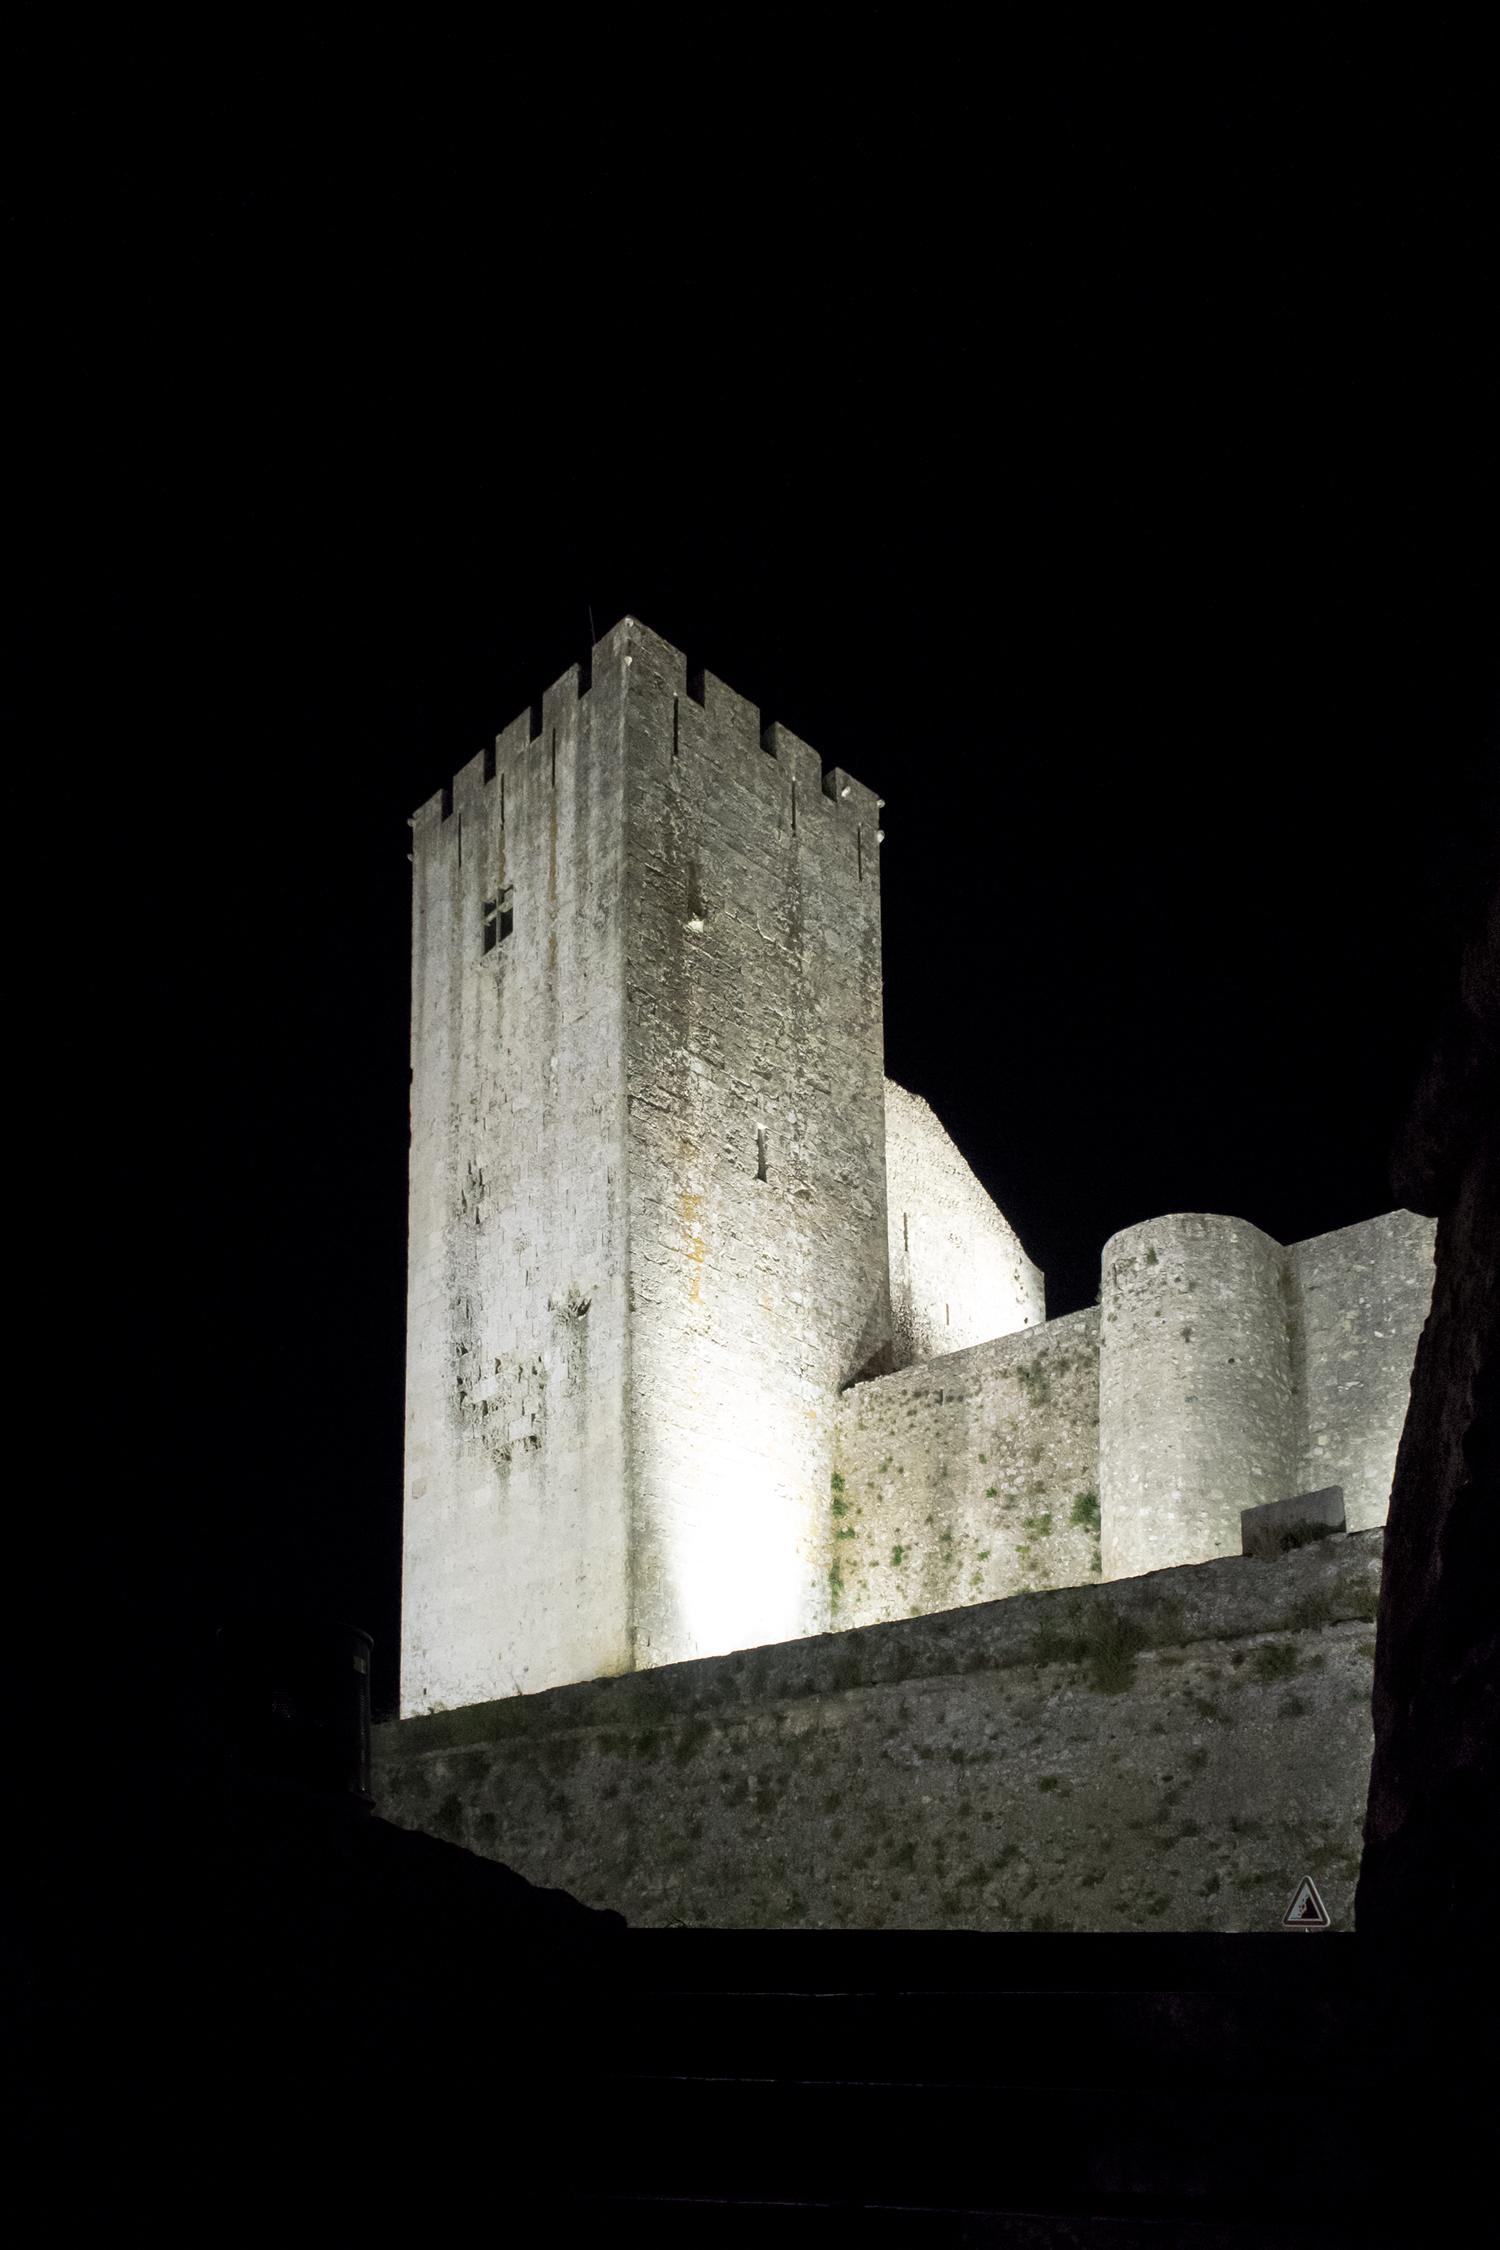 Torre-_1.jpg